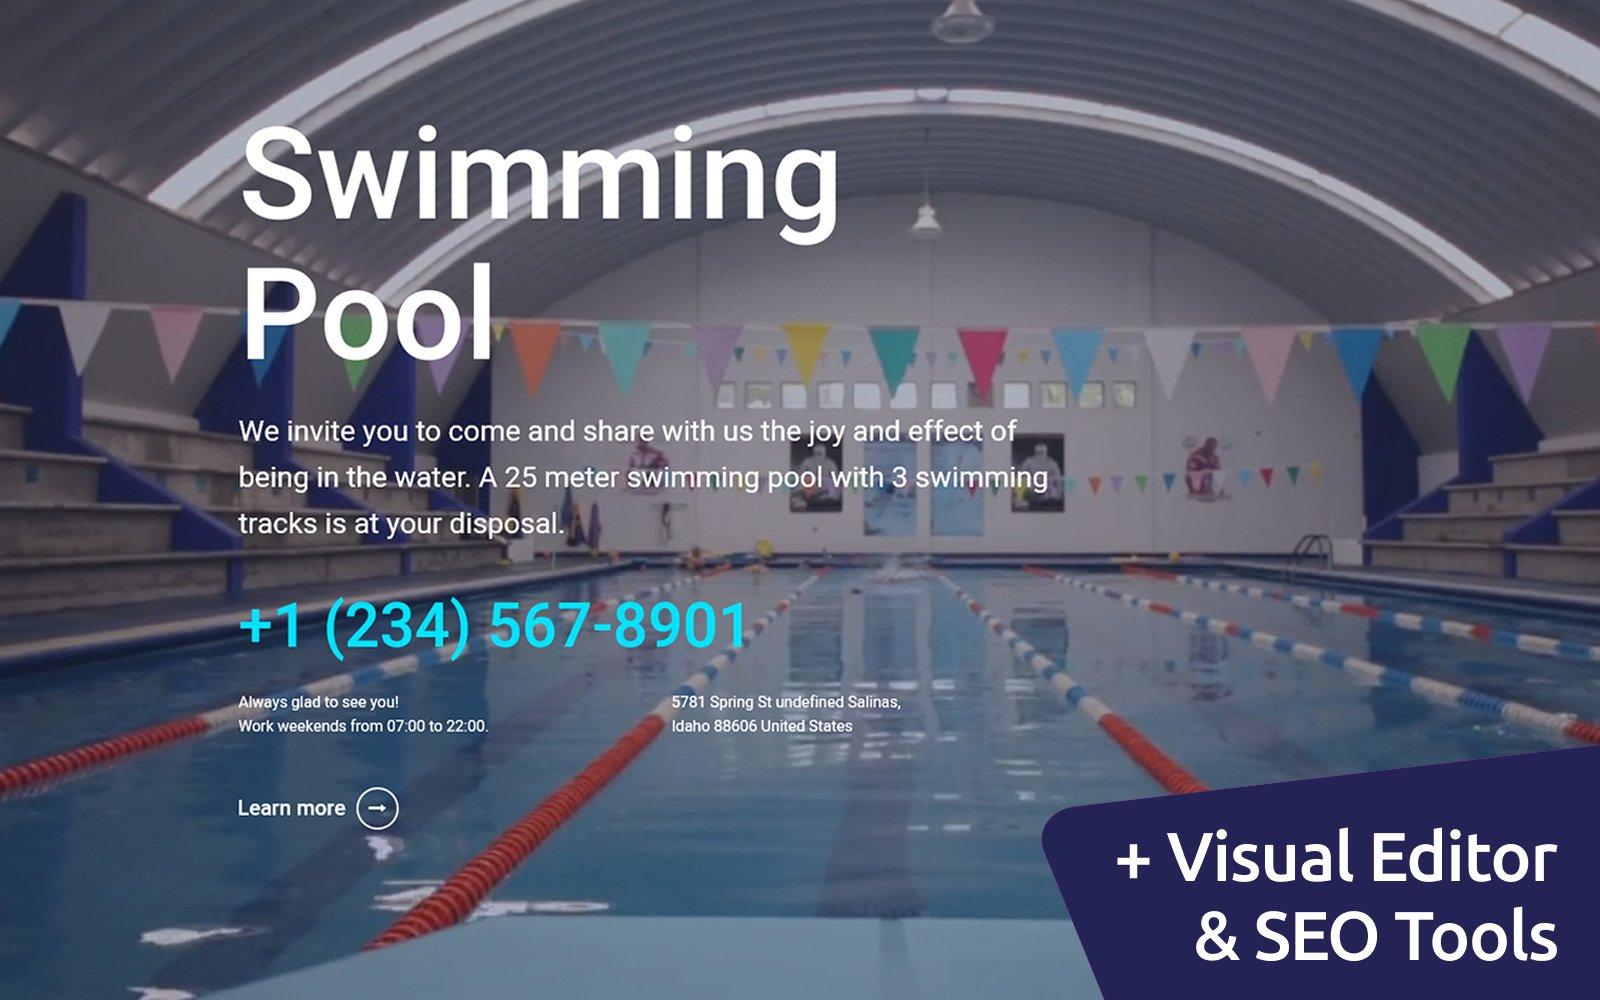 Swimming Pool Moto CMS 3 Template - screenshot